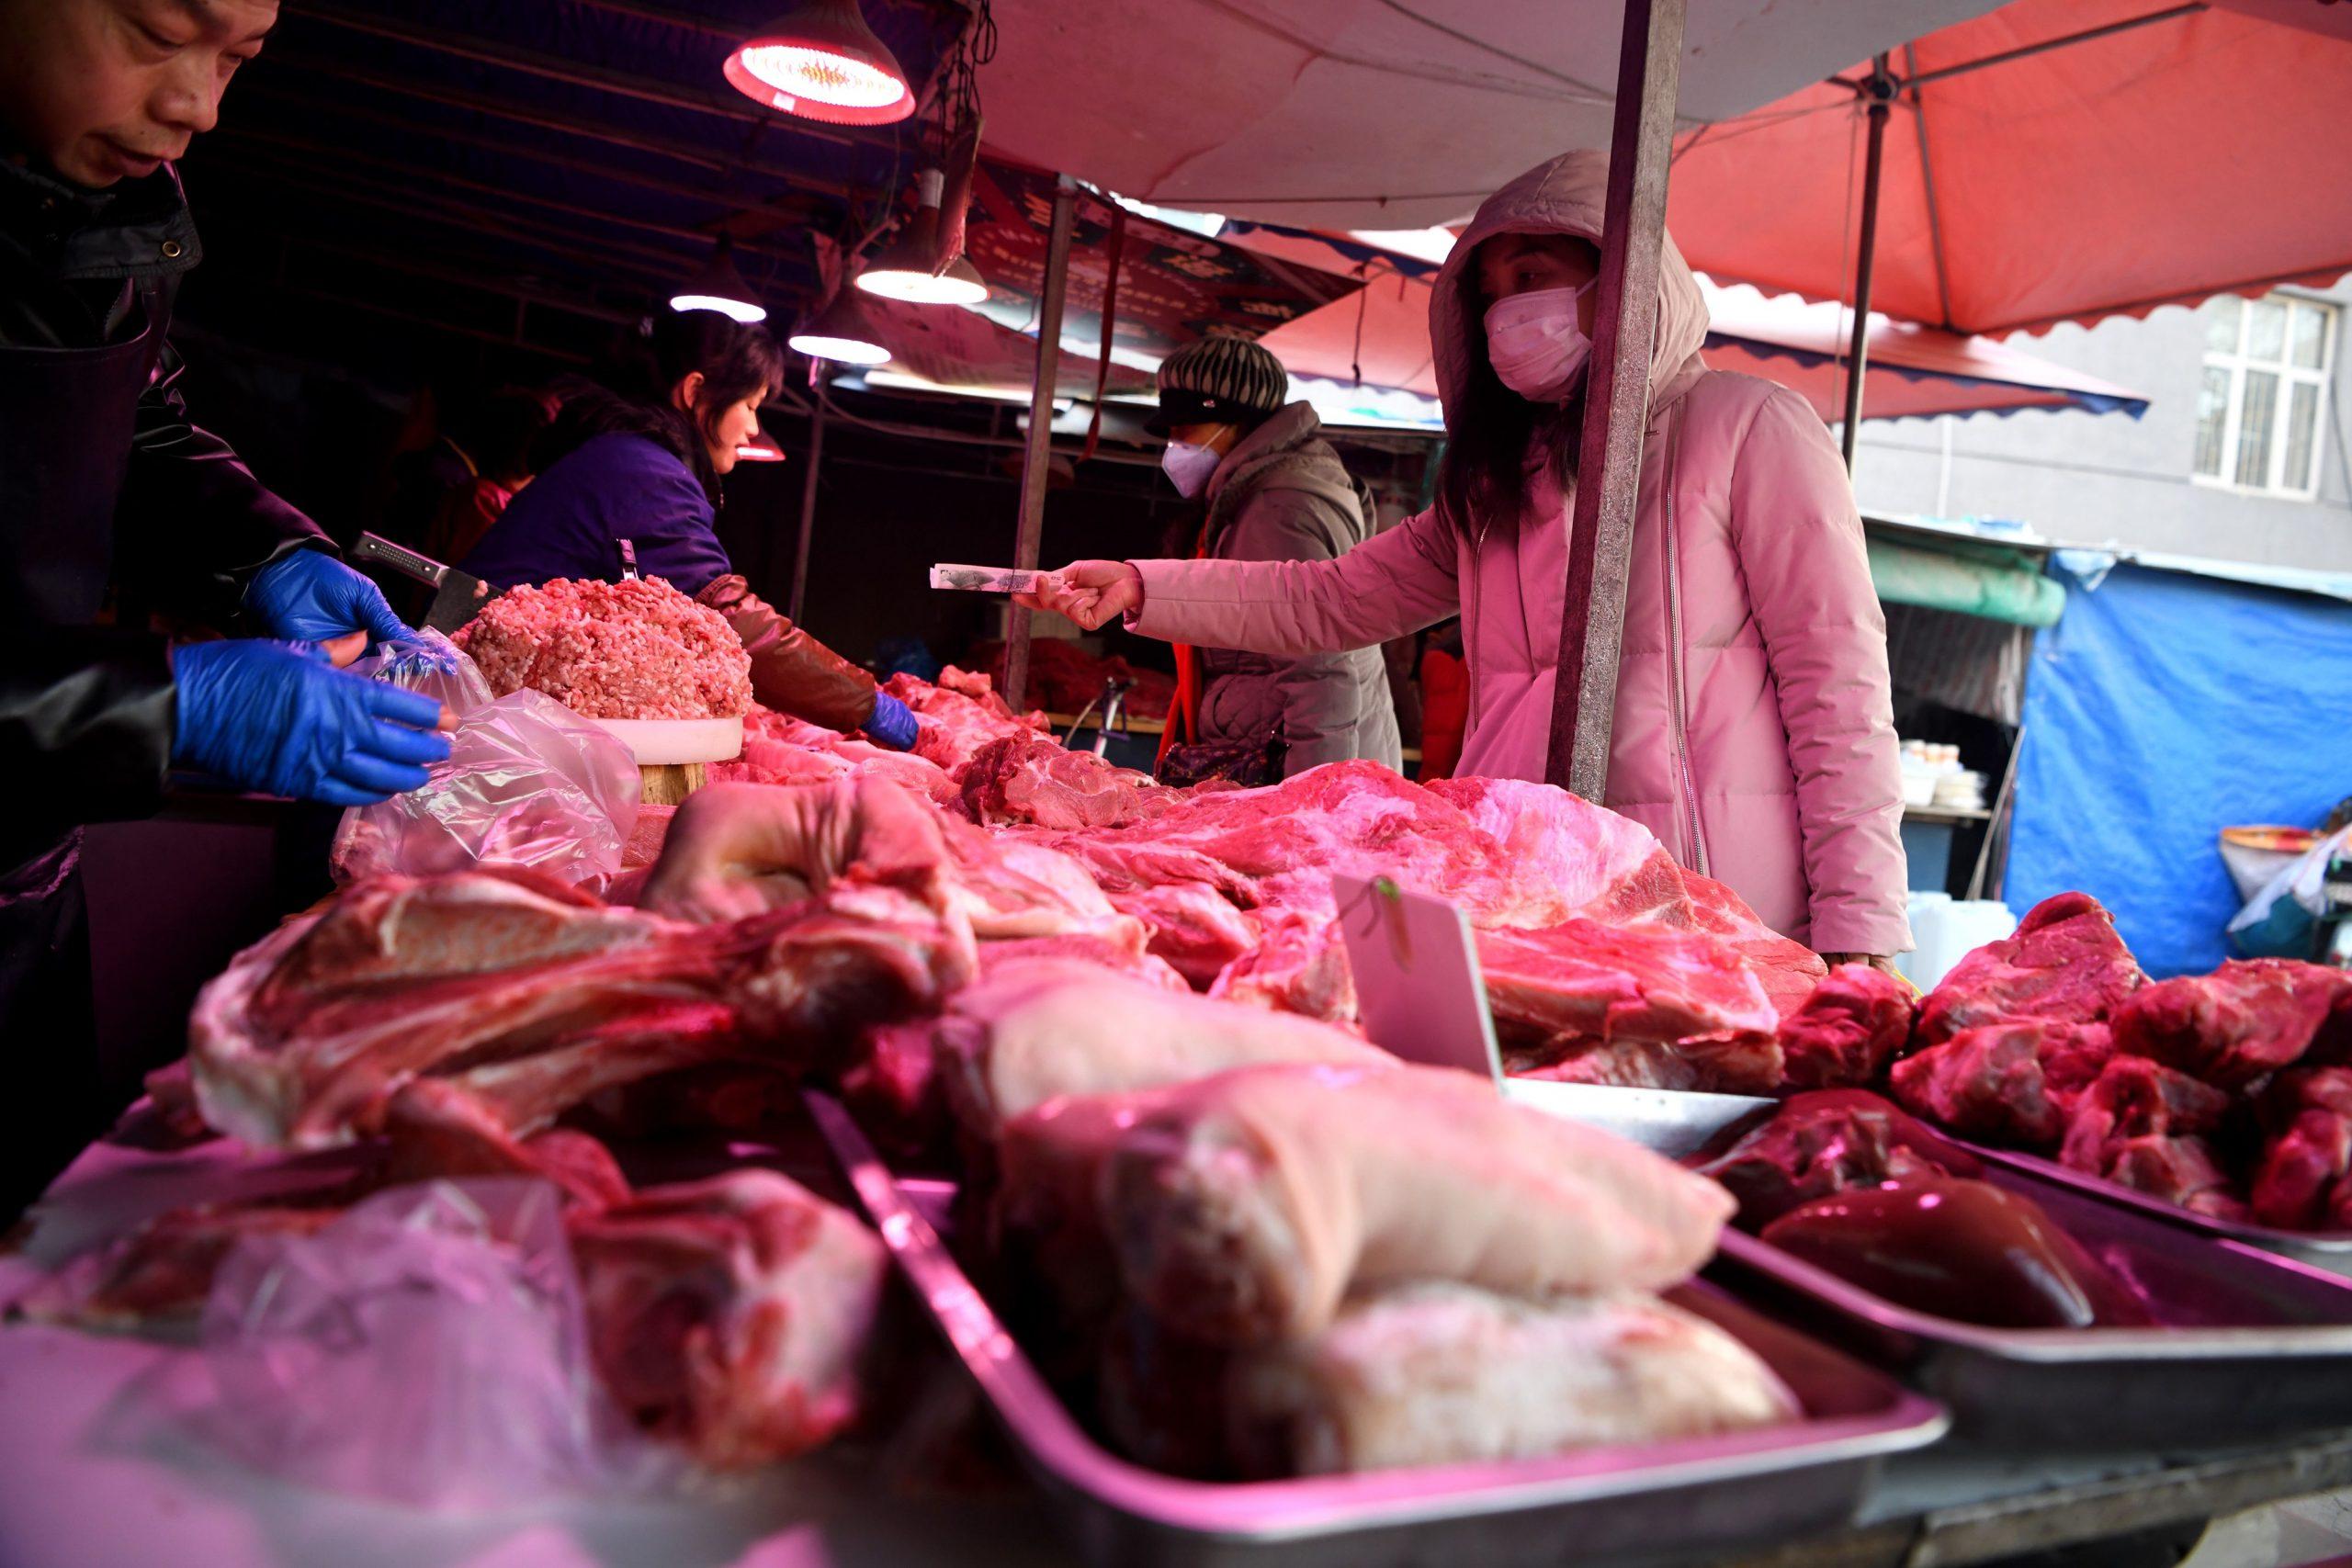 Coronavirus and the future of 'warm meat'